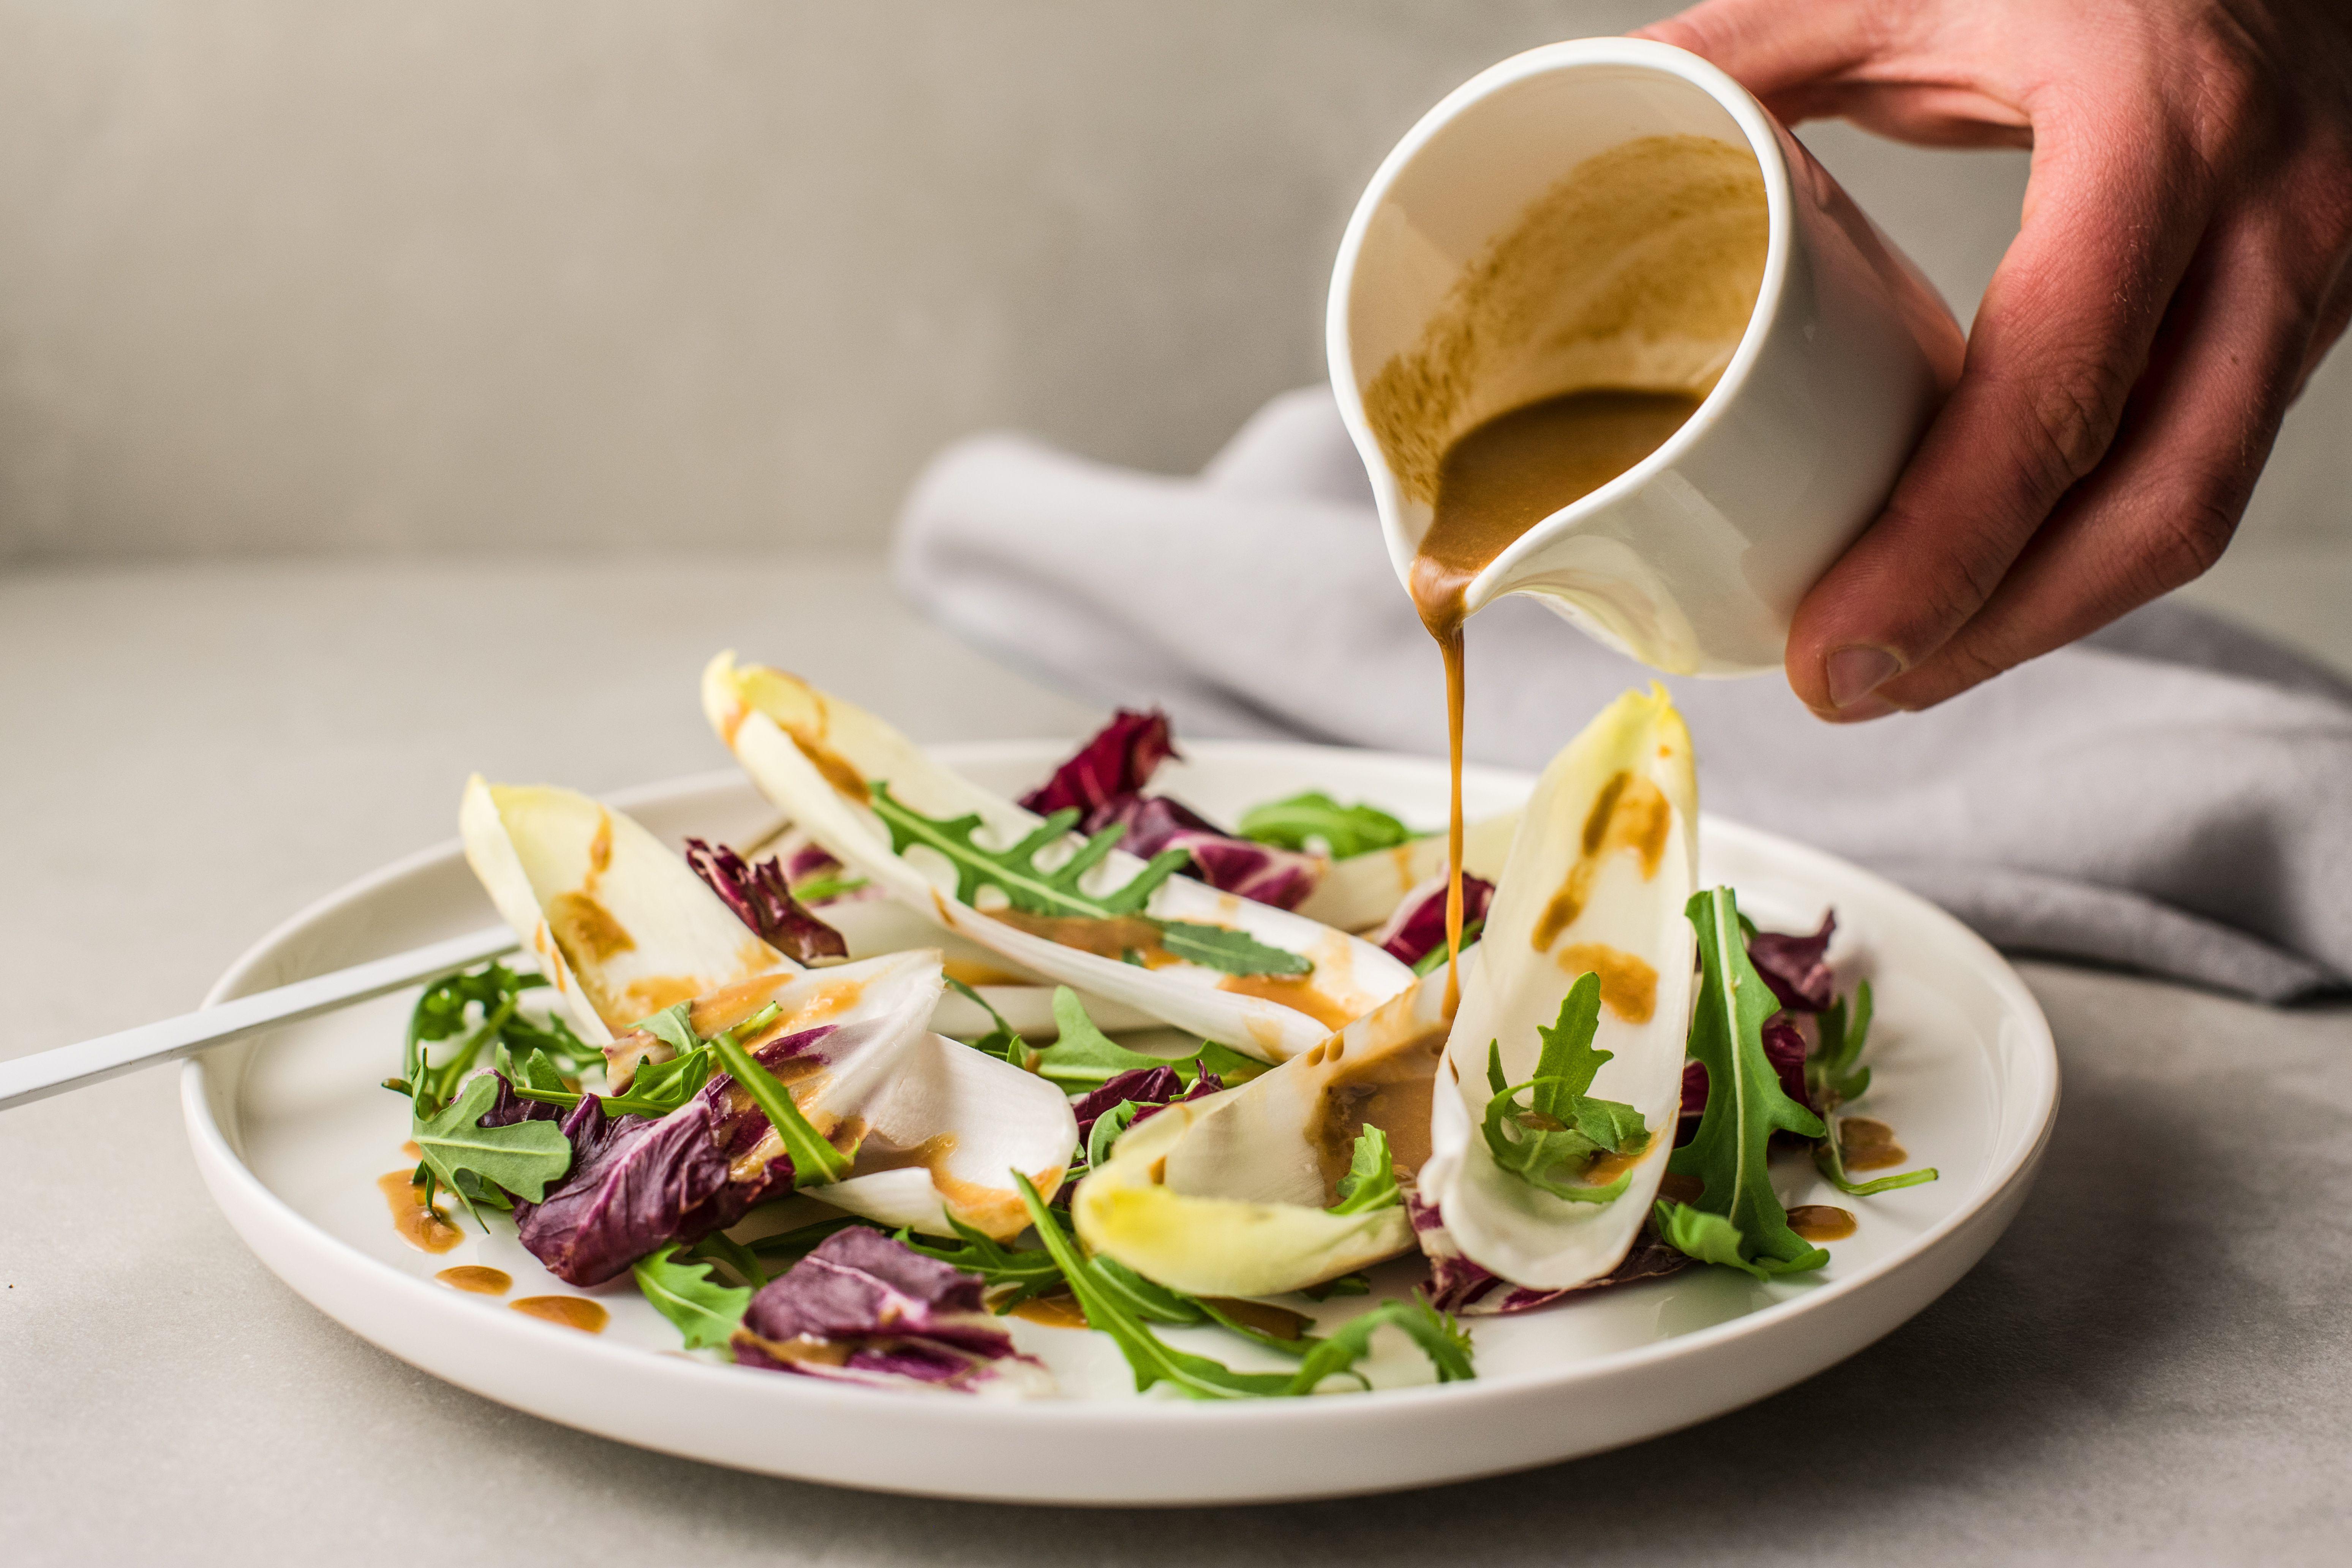 Vegan miso salad dressing